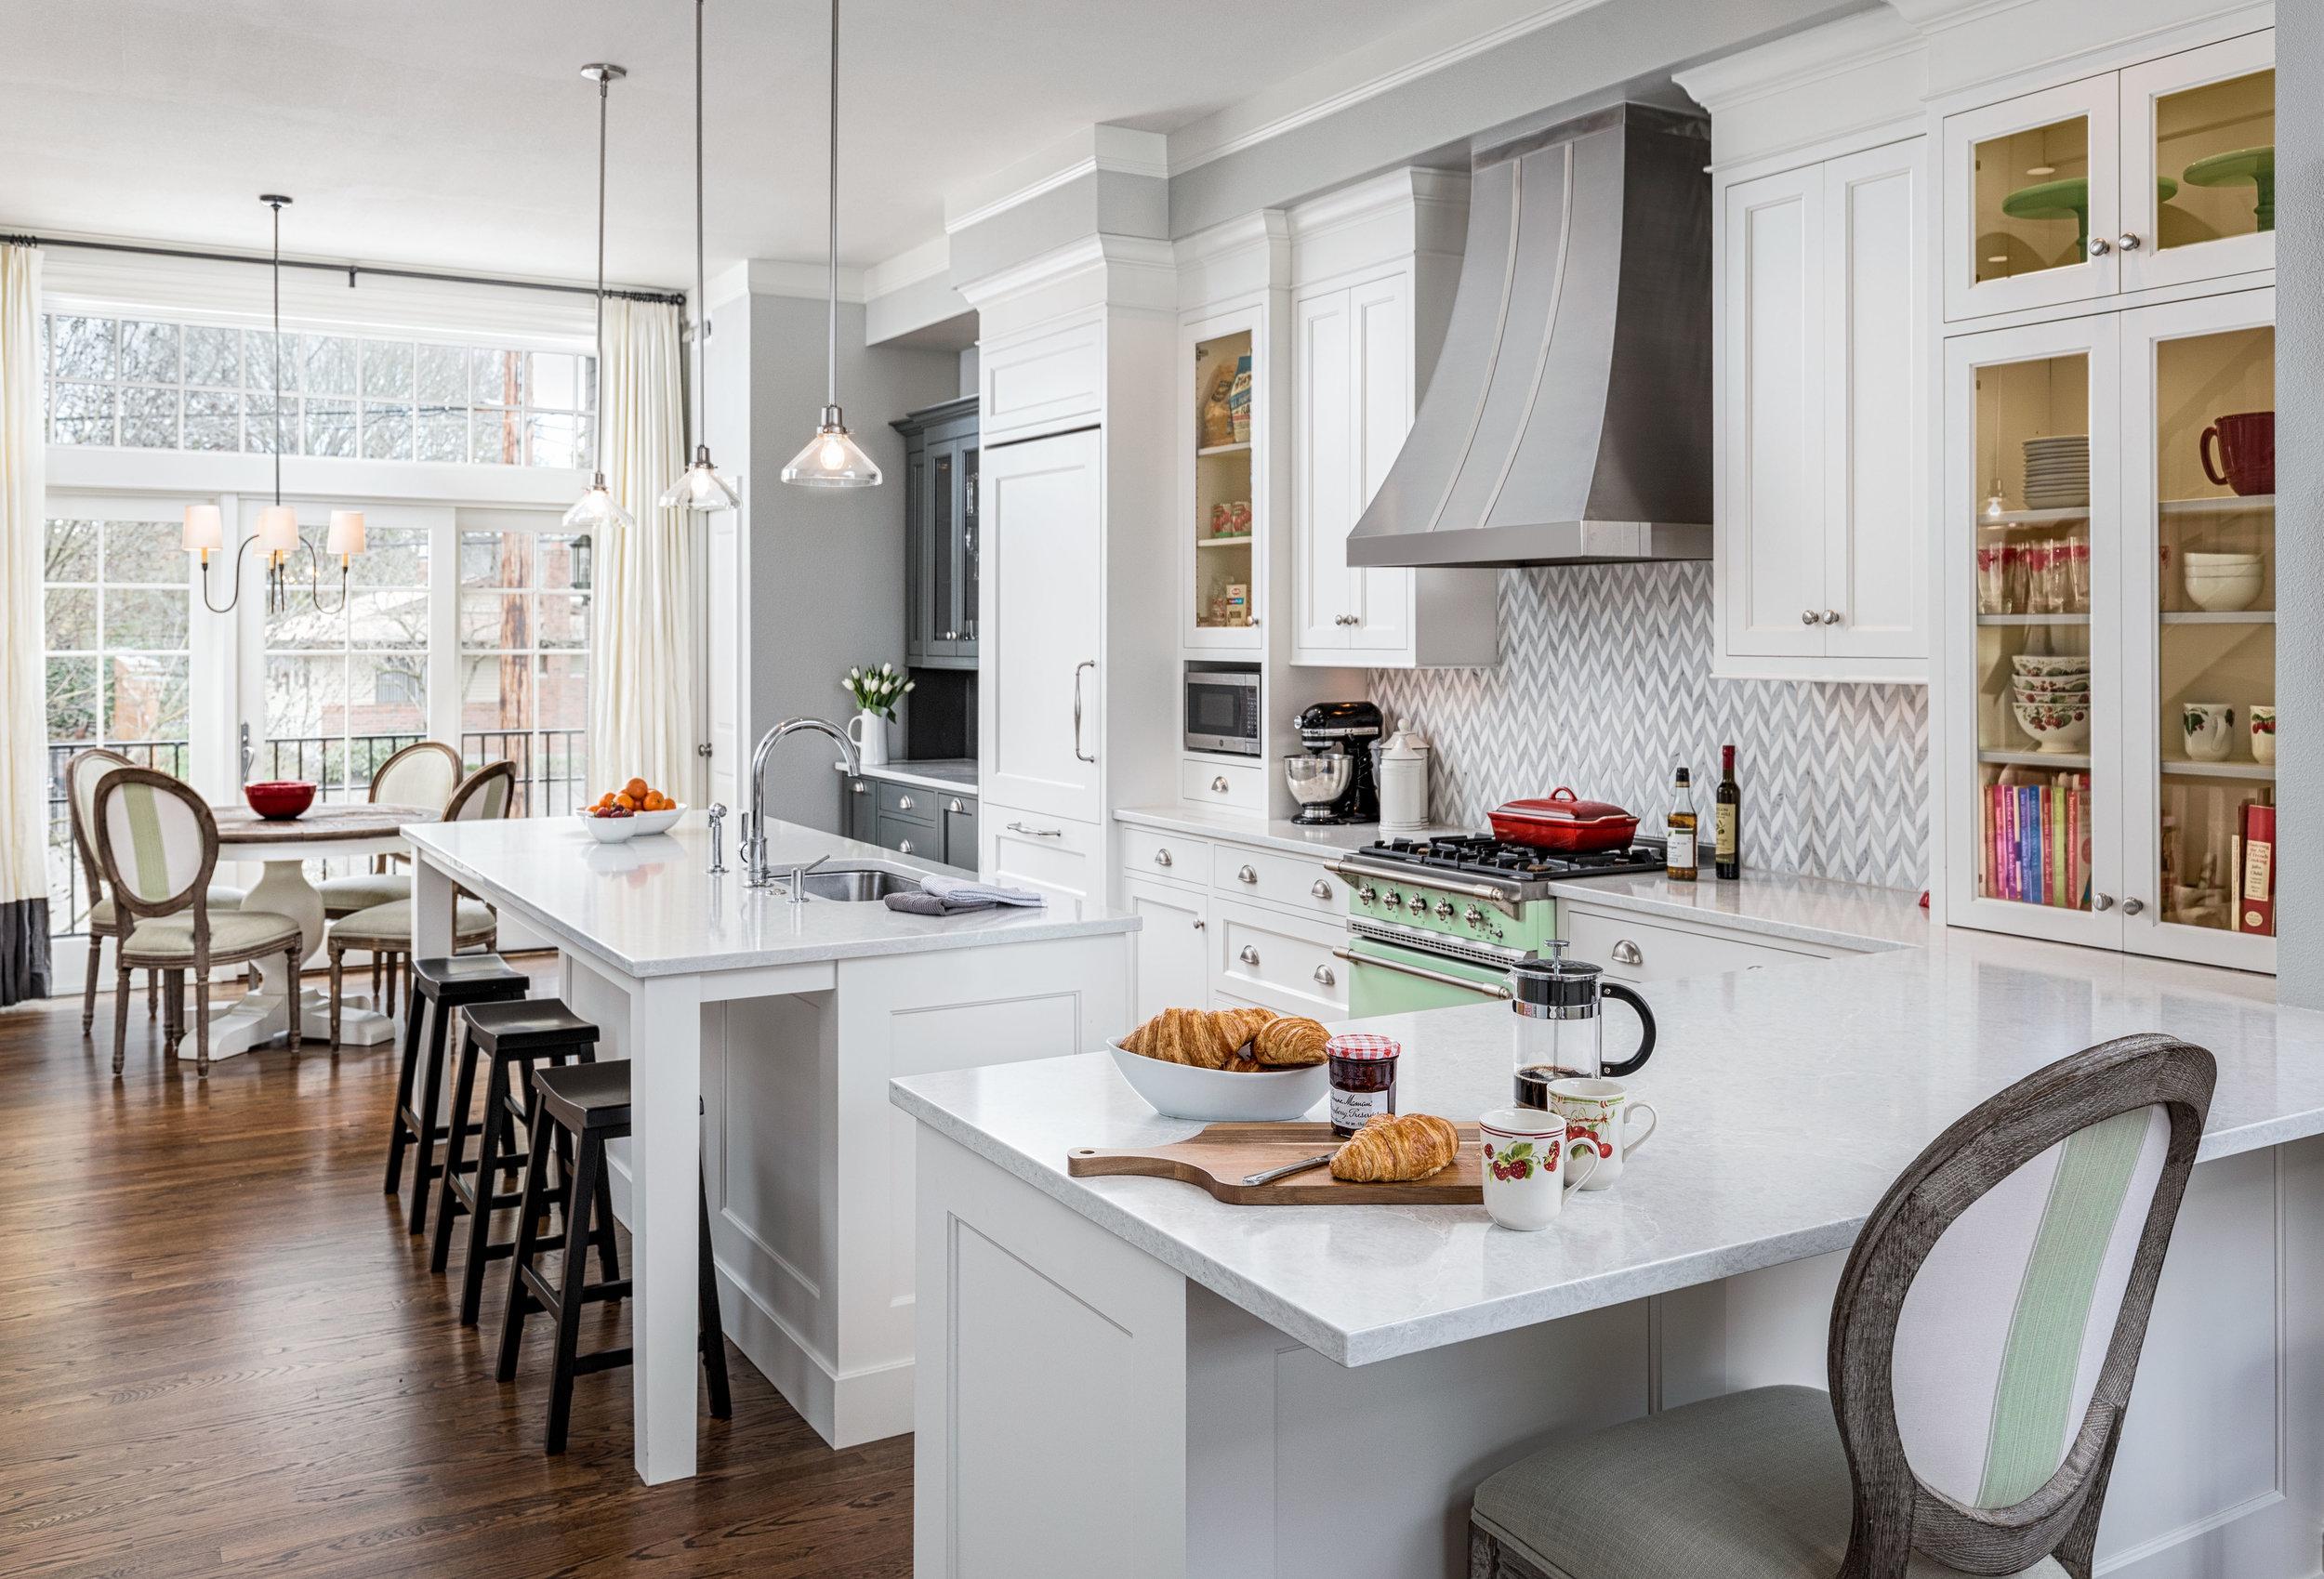 Portland kitchen design by Jenni Leasia Interior Design